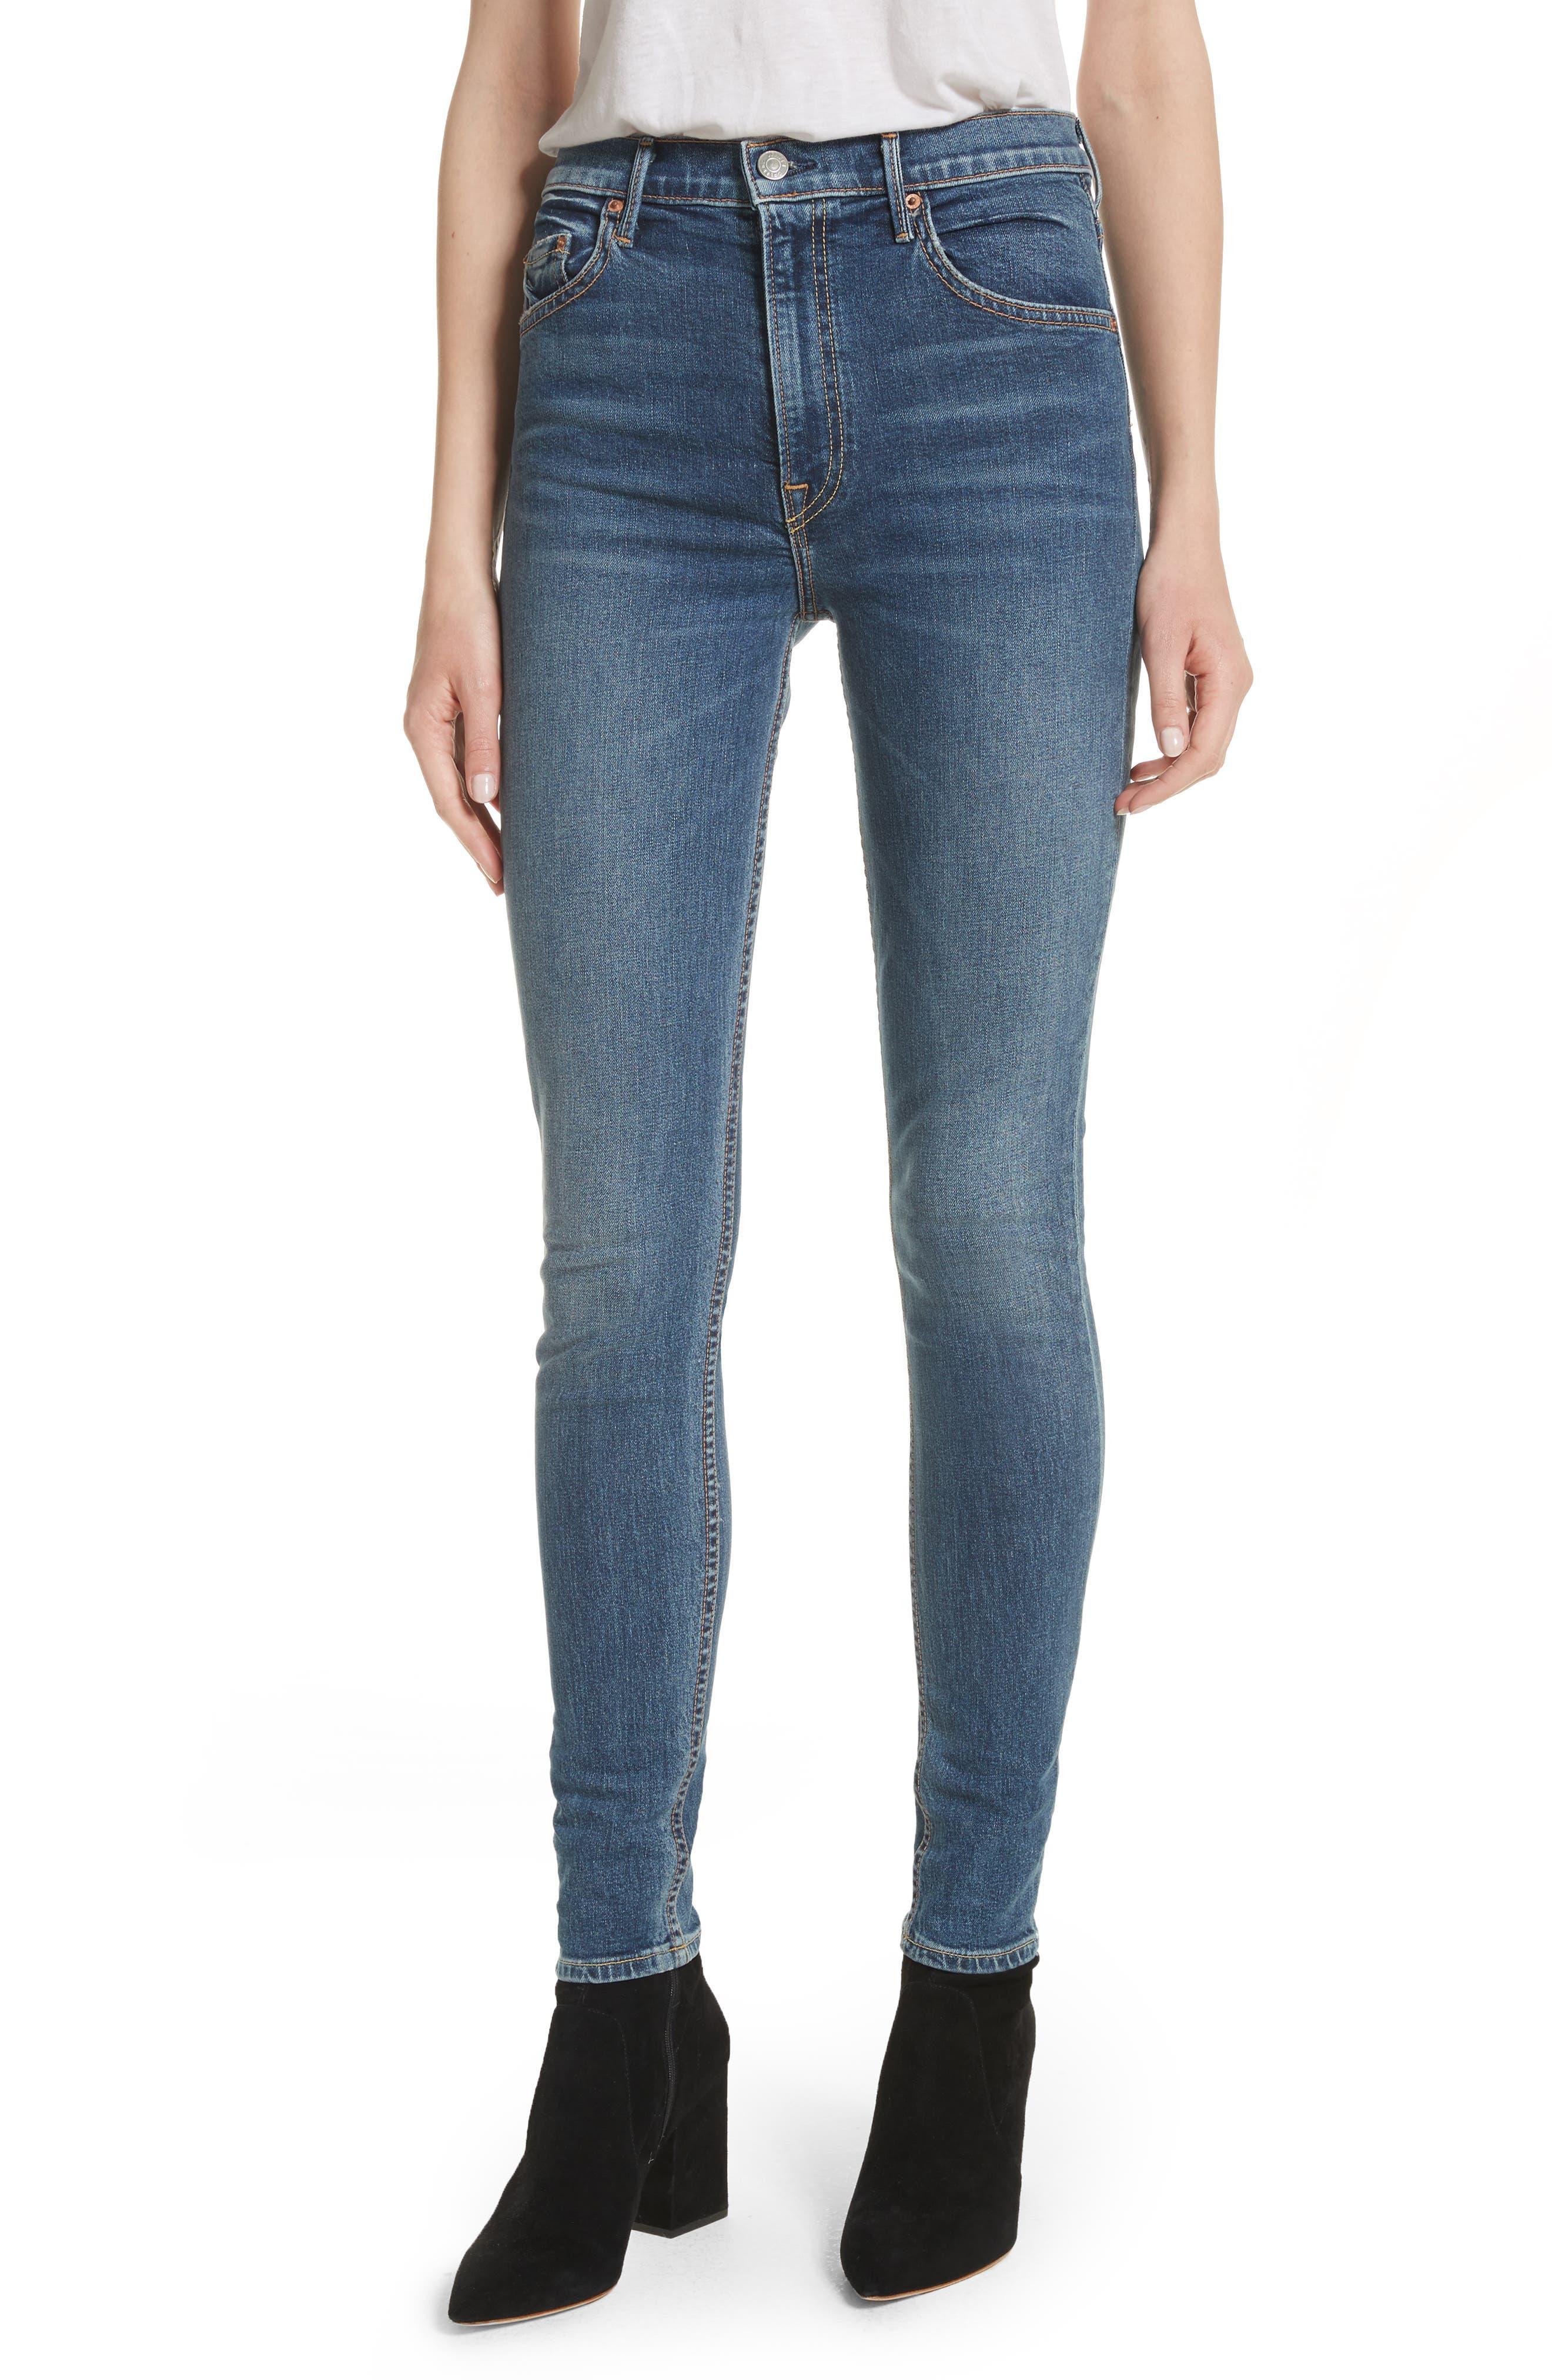 Alternate Image 1 Selected - GRLFRND Kendall Super Stretch High Waist Skinny Jeans (No More Tears)